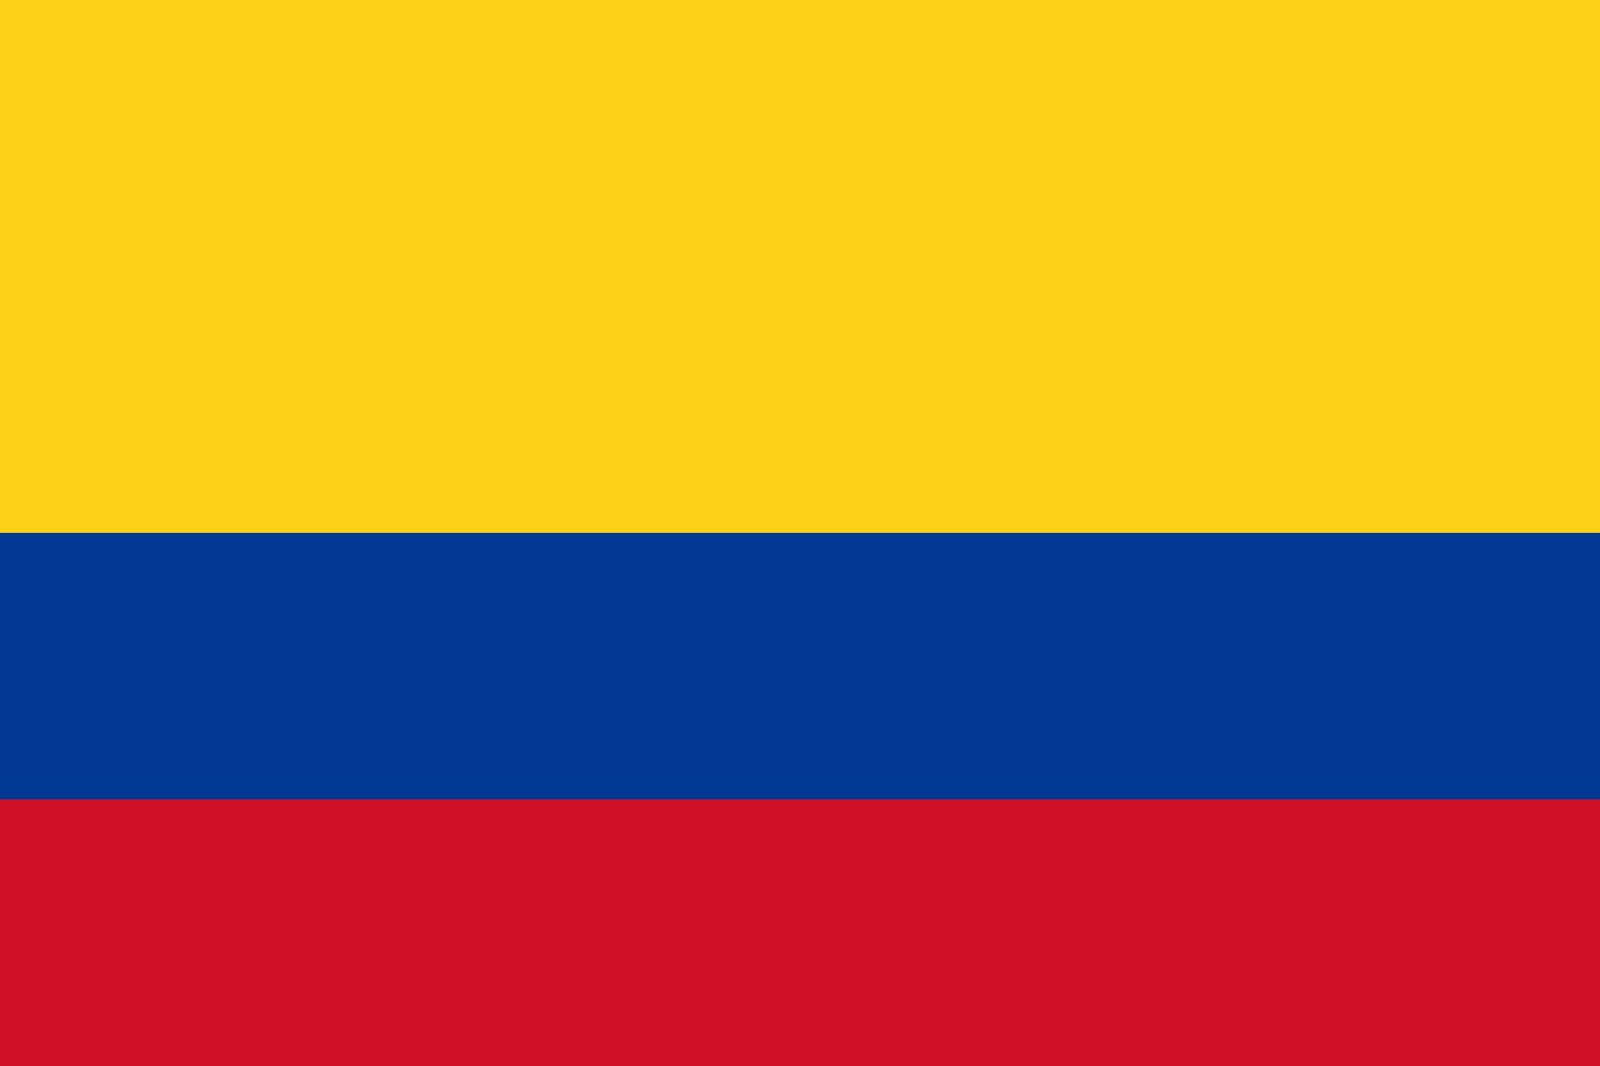 http://carbrandsincurrentproduction.blogspot.com.es/search/label/Colombia